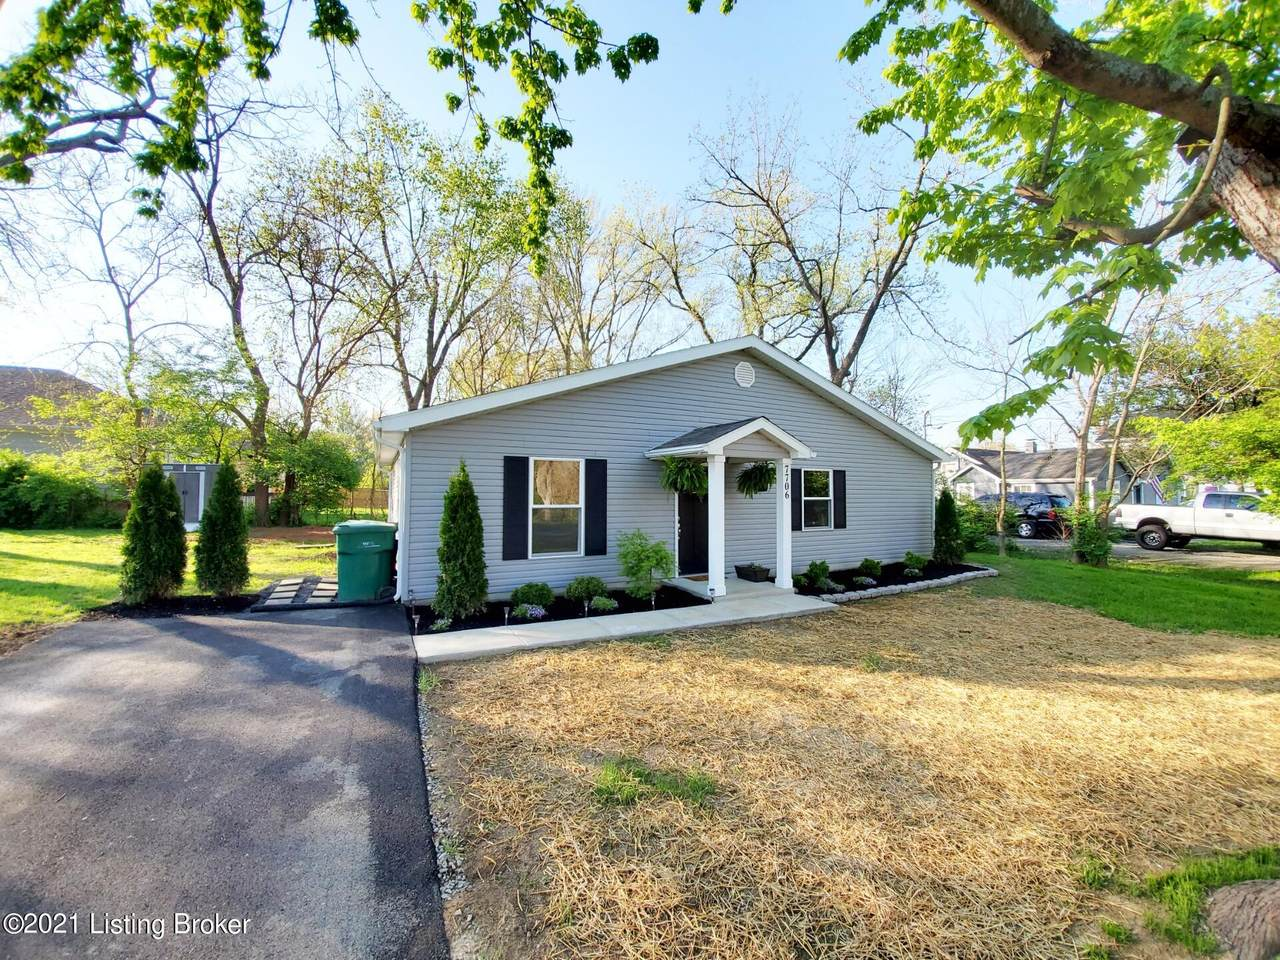 7706 Warwick Ave - Photo 1